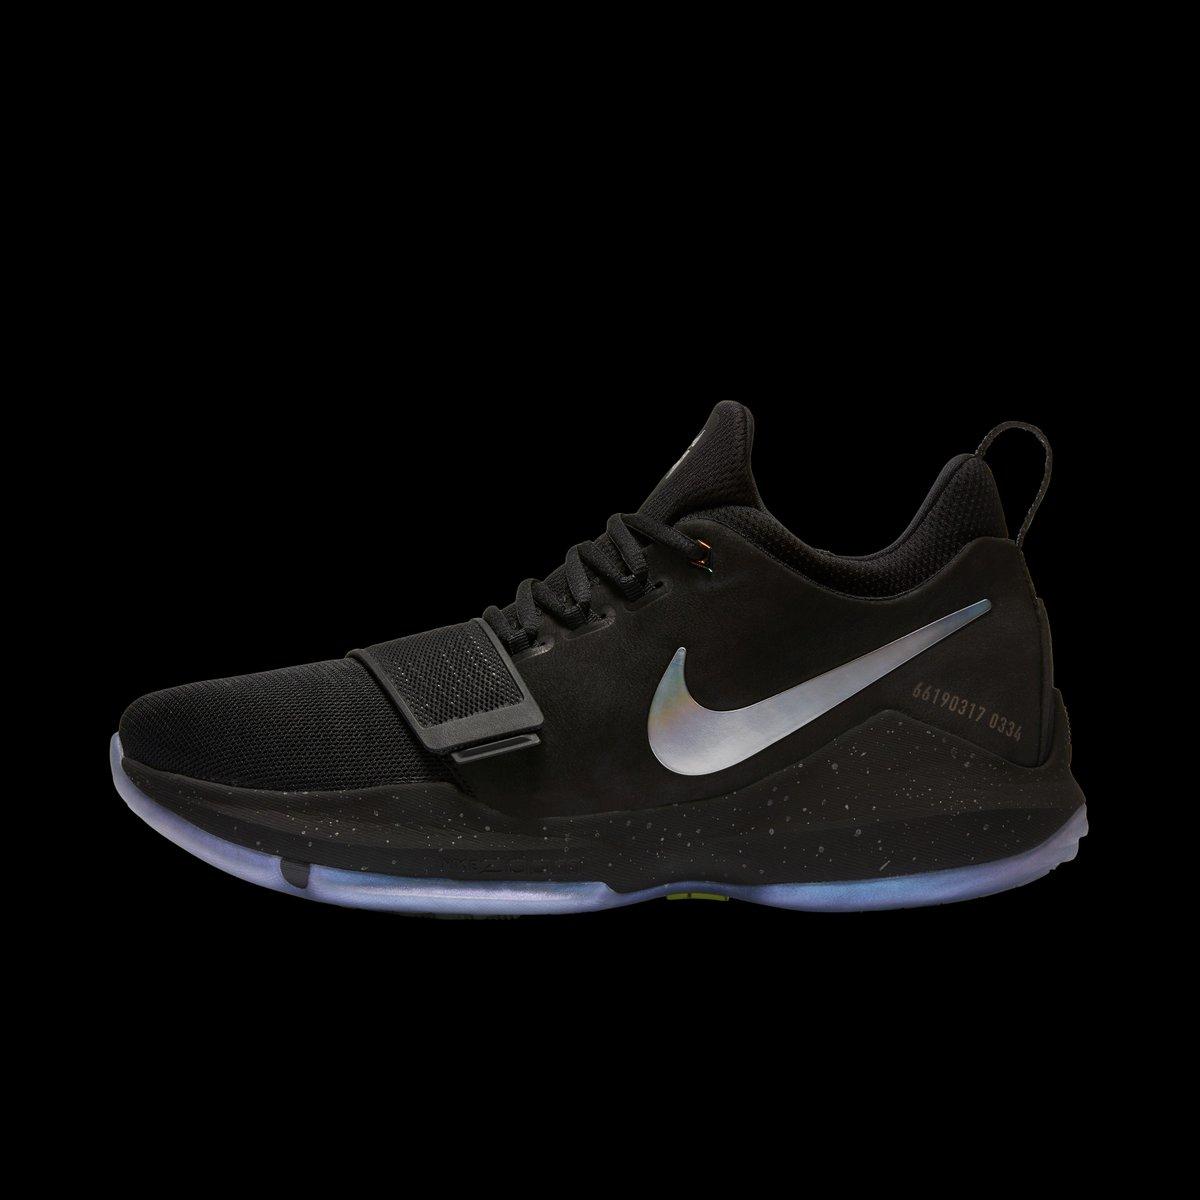 Nike Men's Free RN 2018 Running Shoes Black | Sport Chek